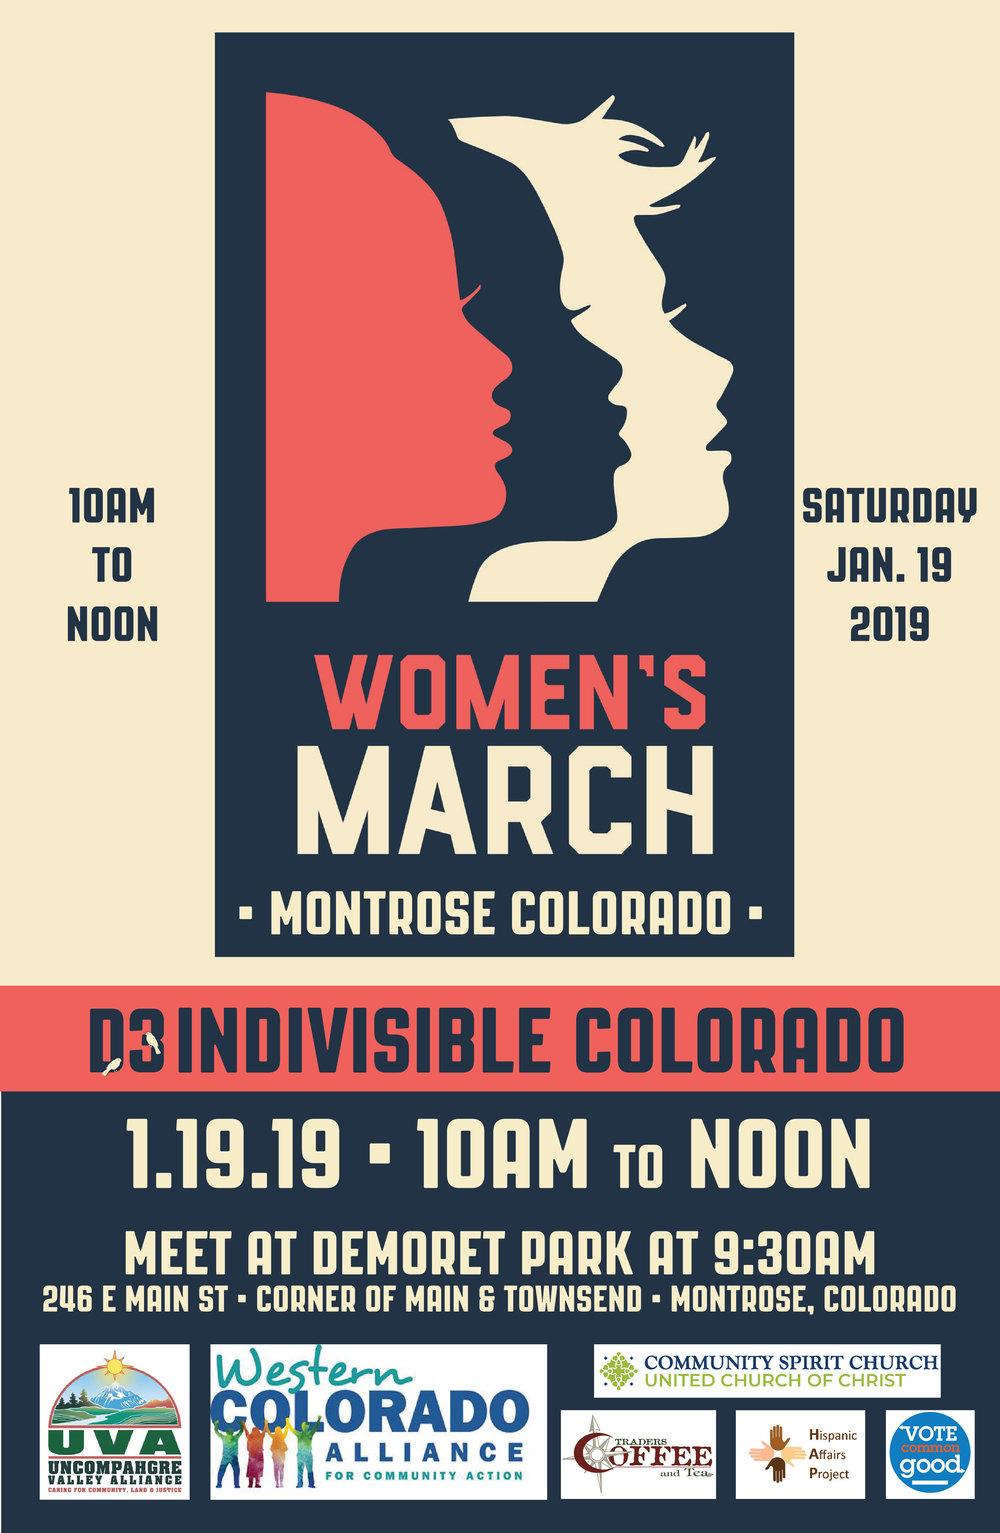 WomensMarch-Poster2018.PRINT-01.jpg